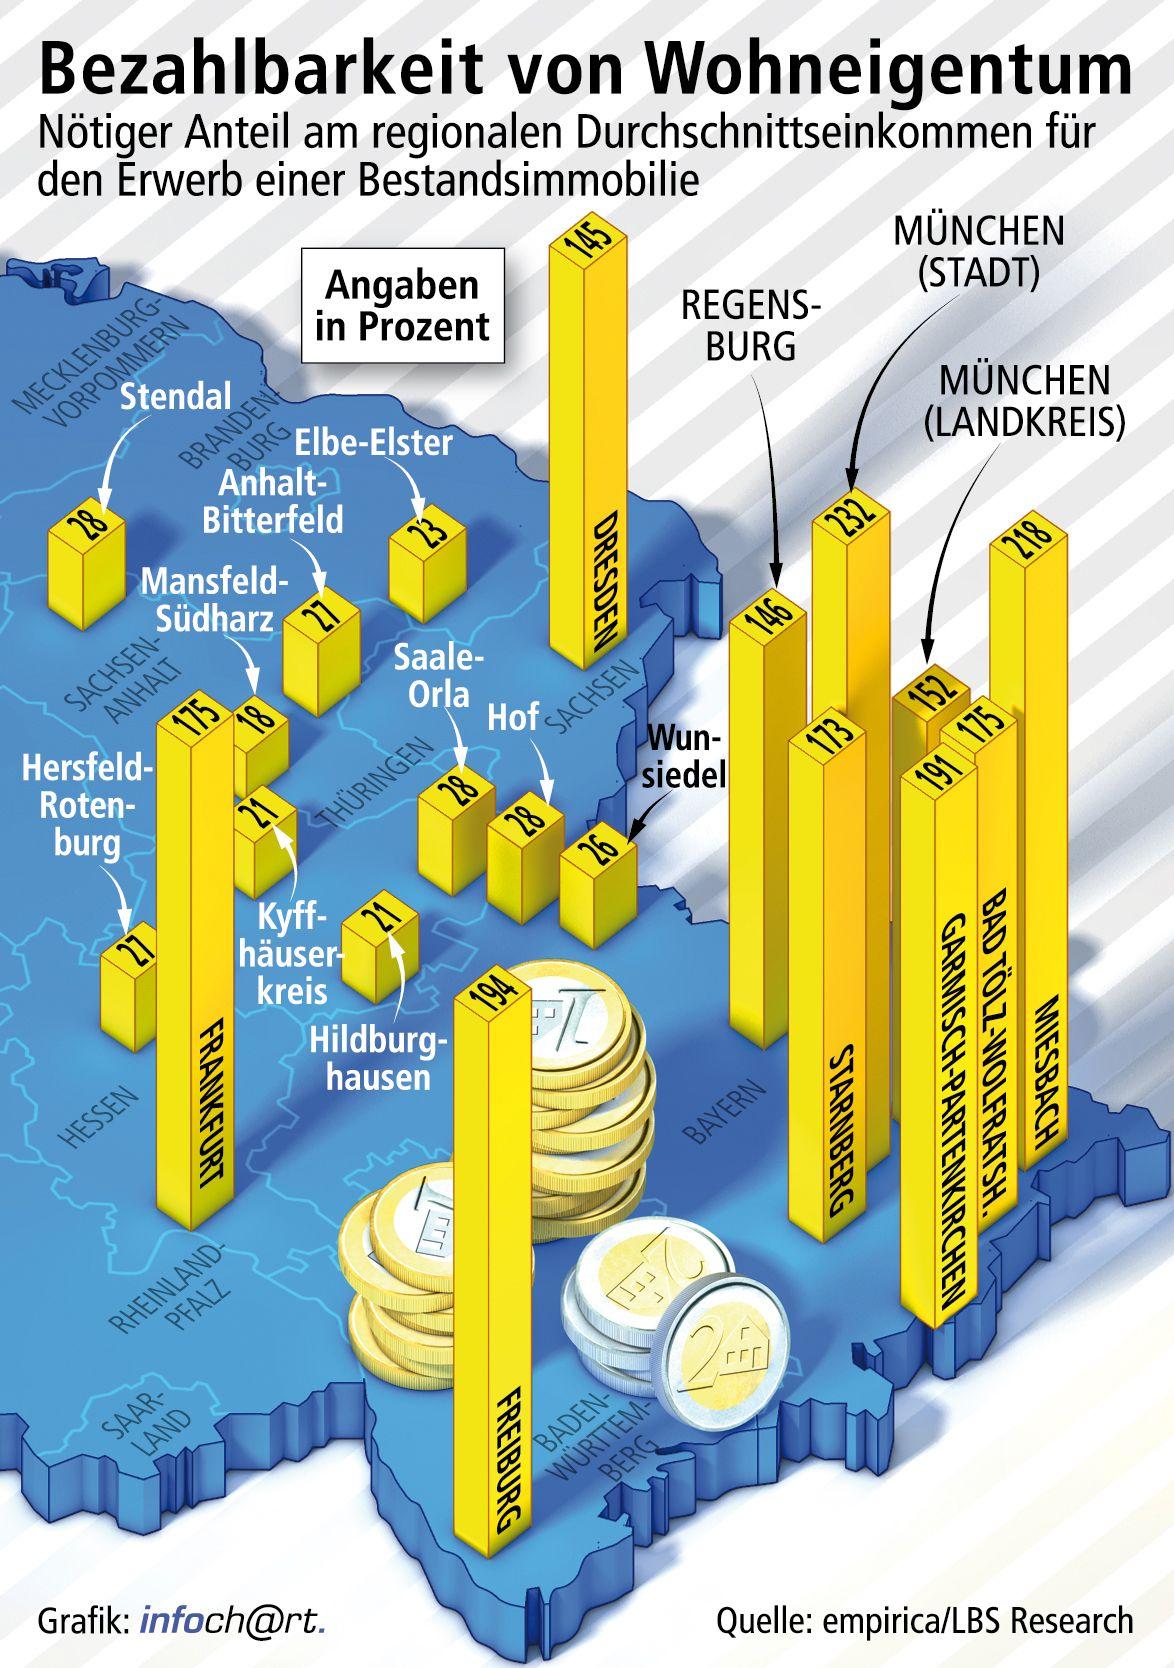 Finanzierungslast niedriger als 2011